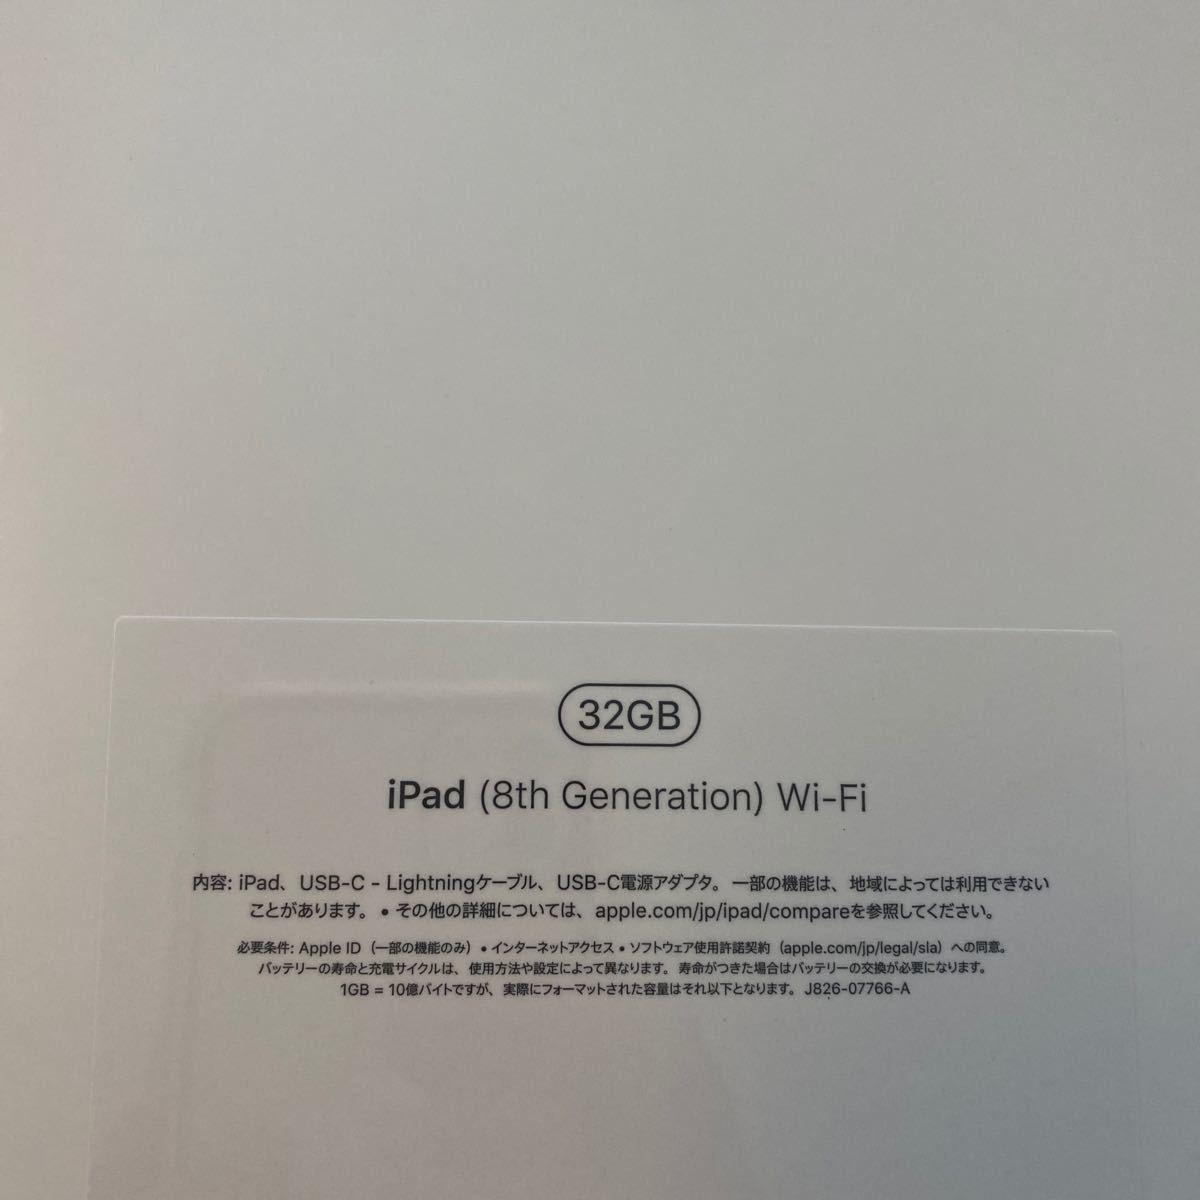 iPad 10.2インチ Wi-Fi 32GB ゴールド 2020年モデル